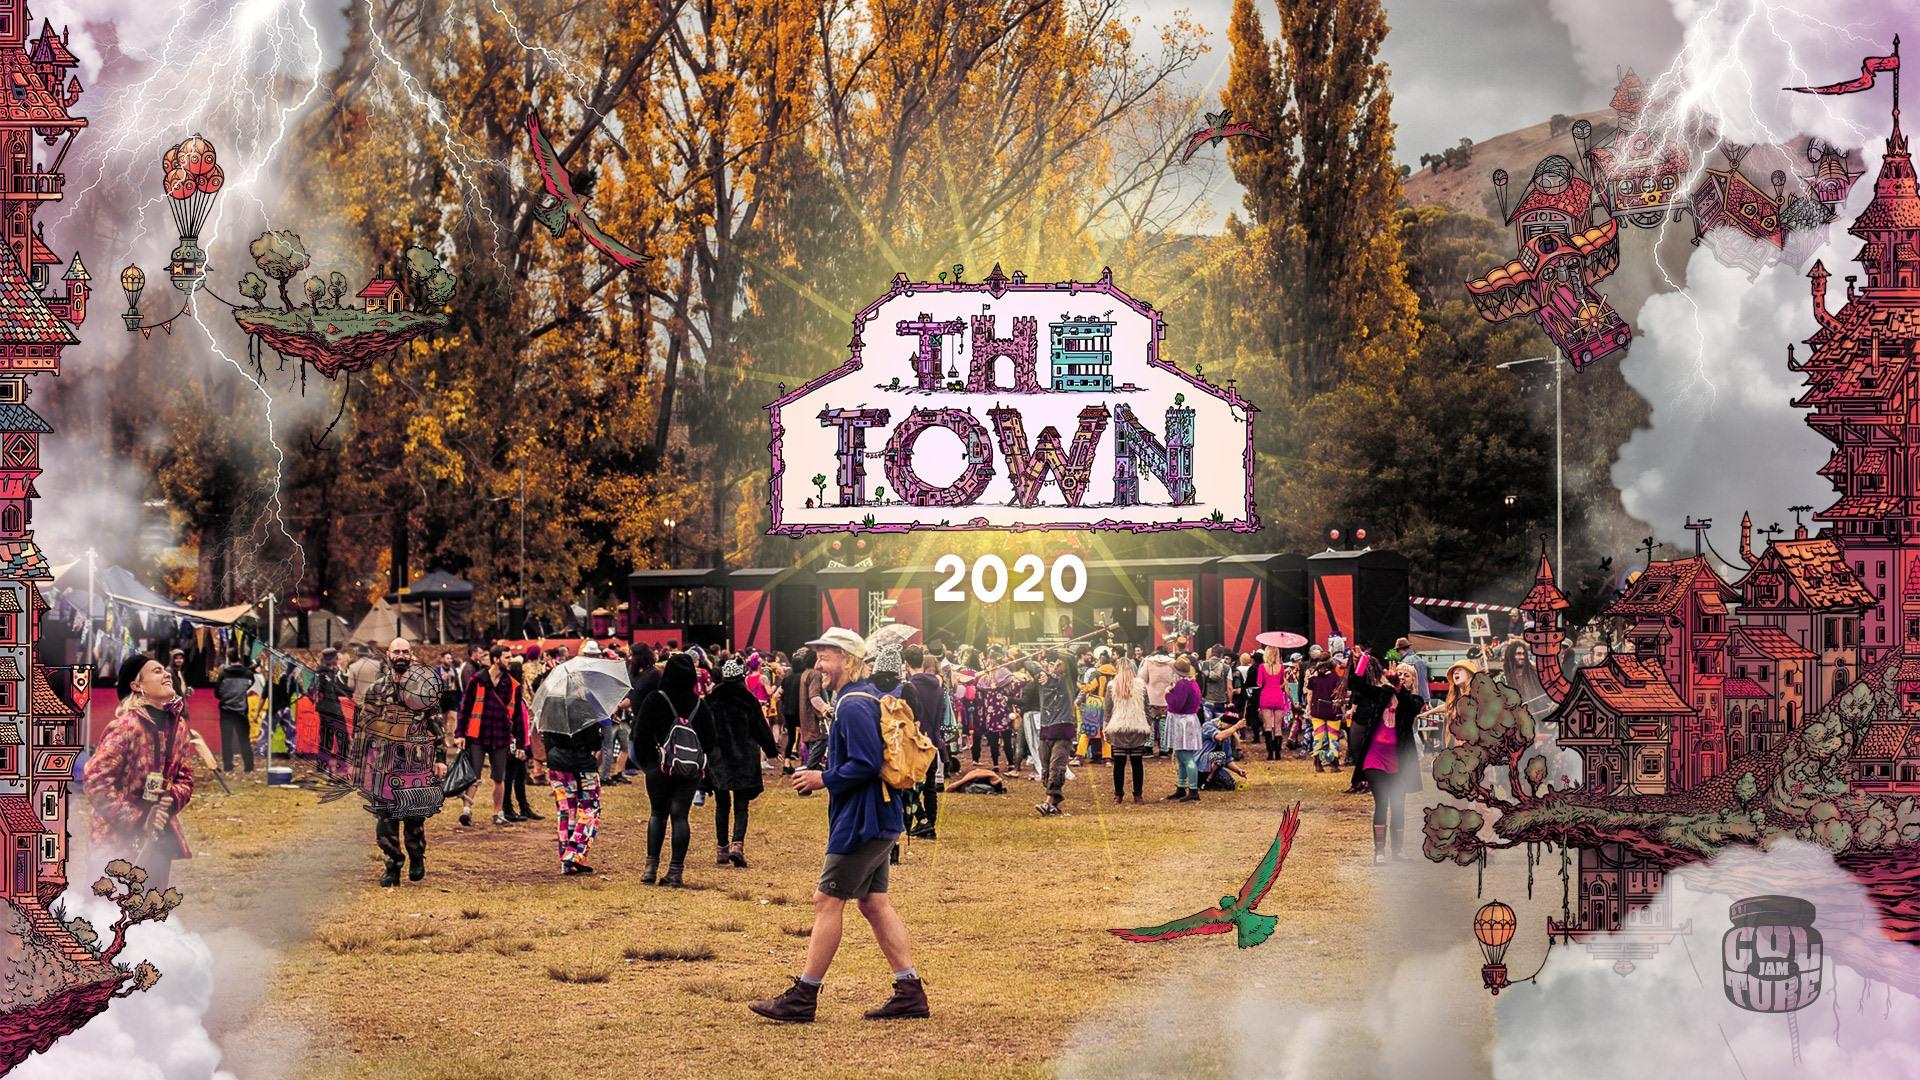 The Town Festival Australia 2020